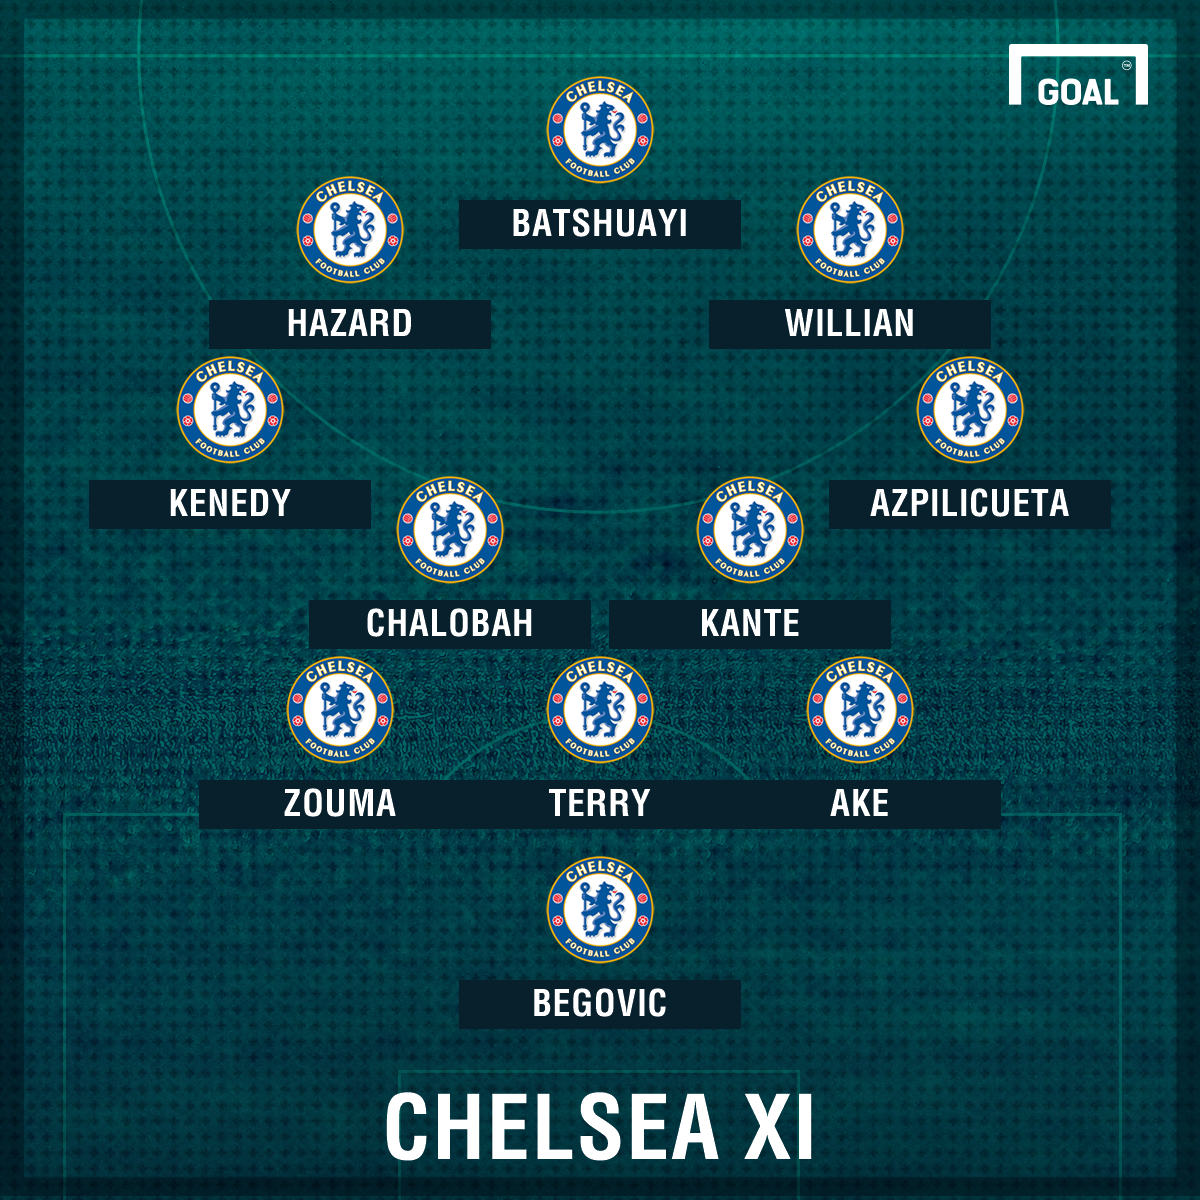 Chelsea XI vs Watford